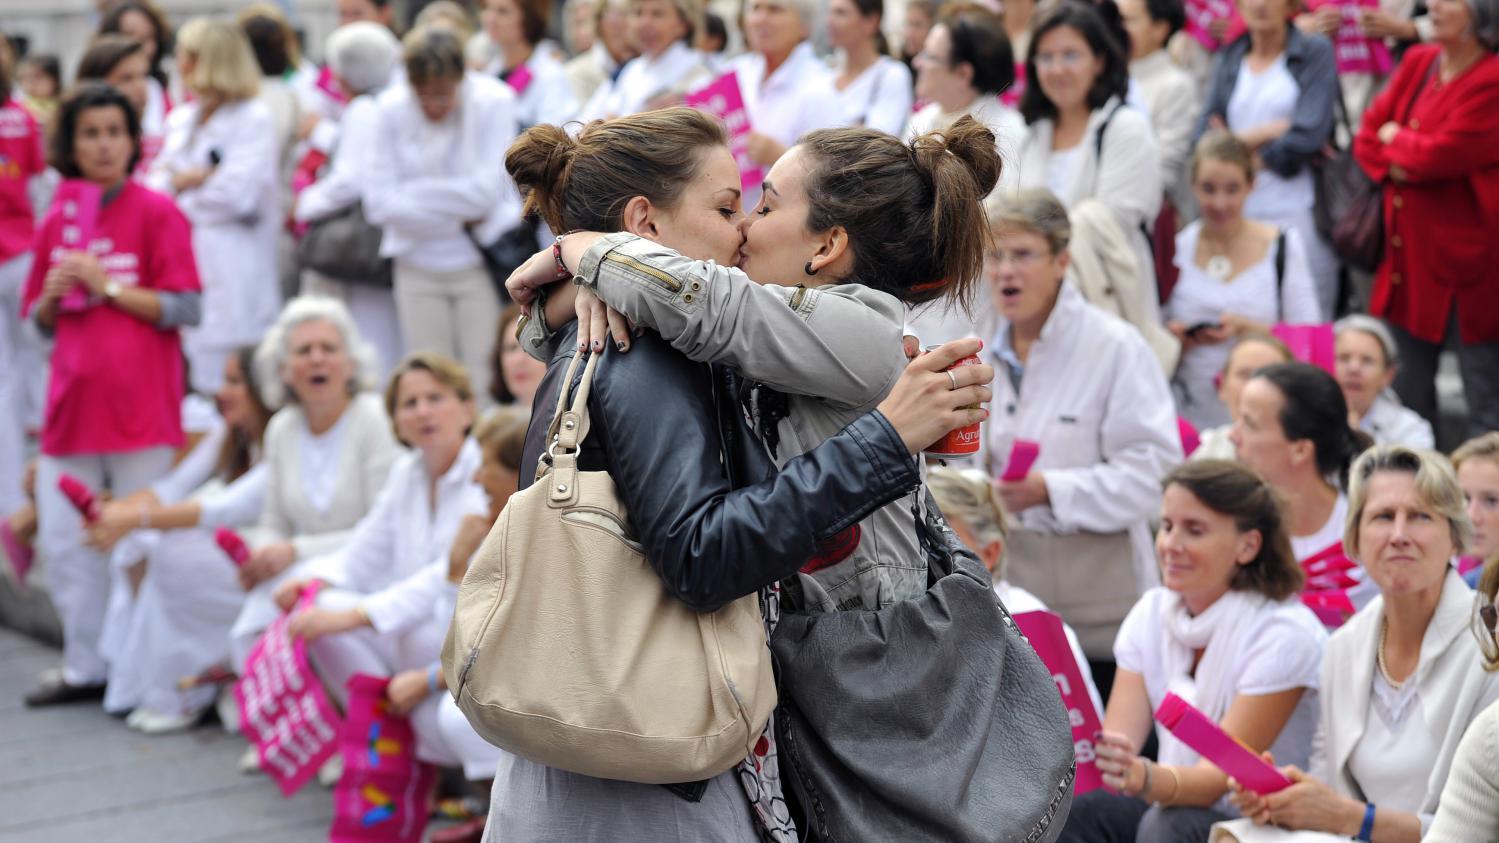 Teen Girls première lesbienne sexe gay.. con